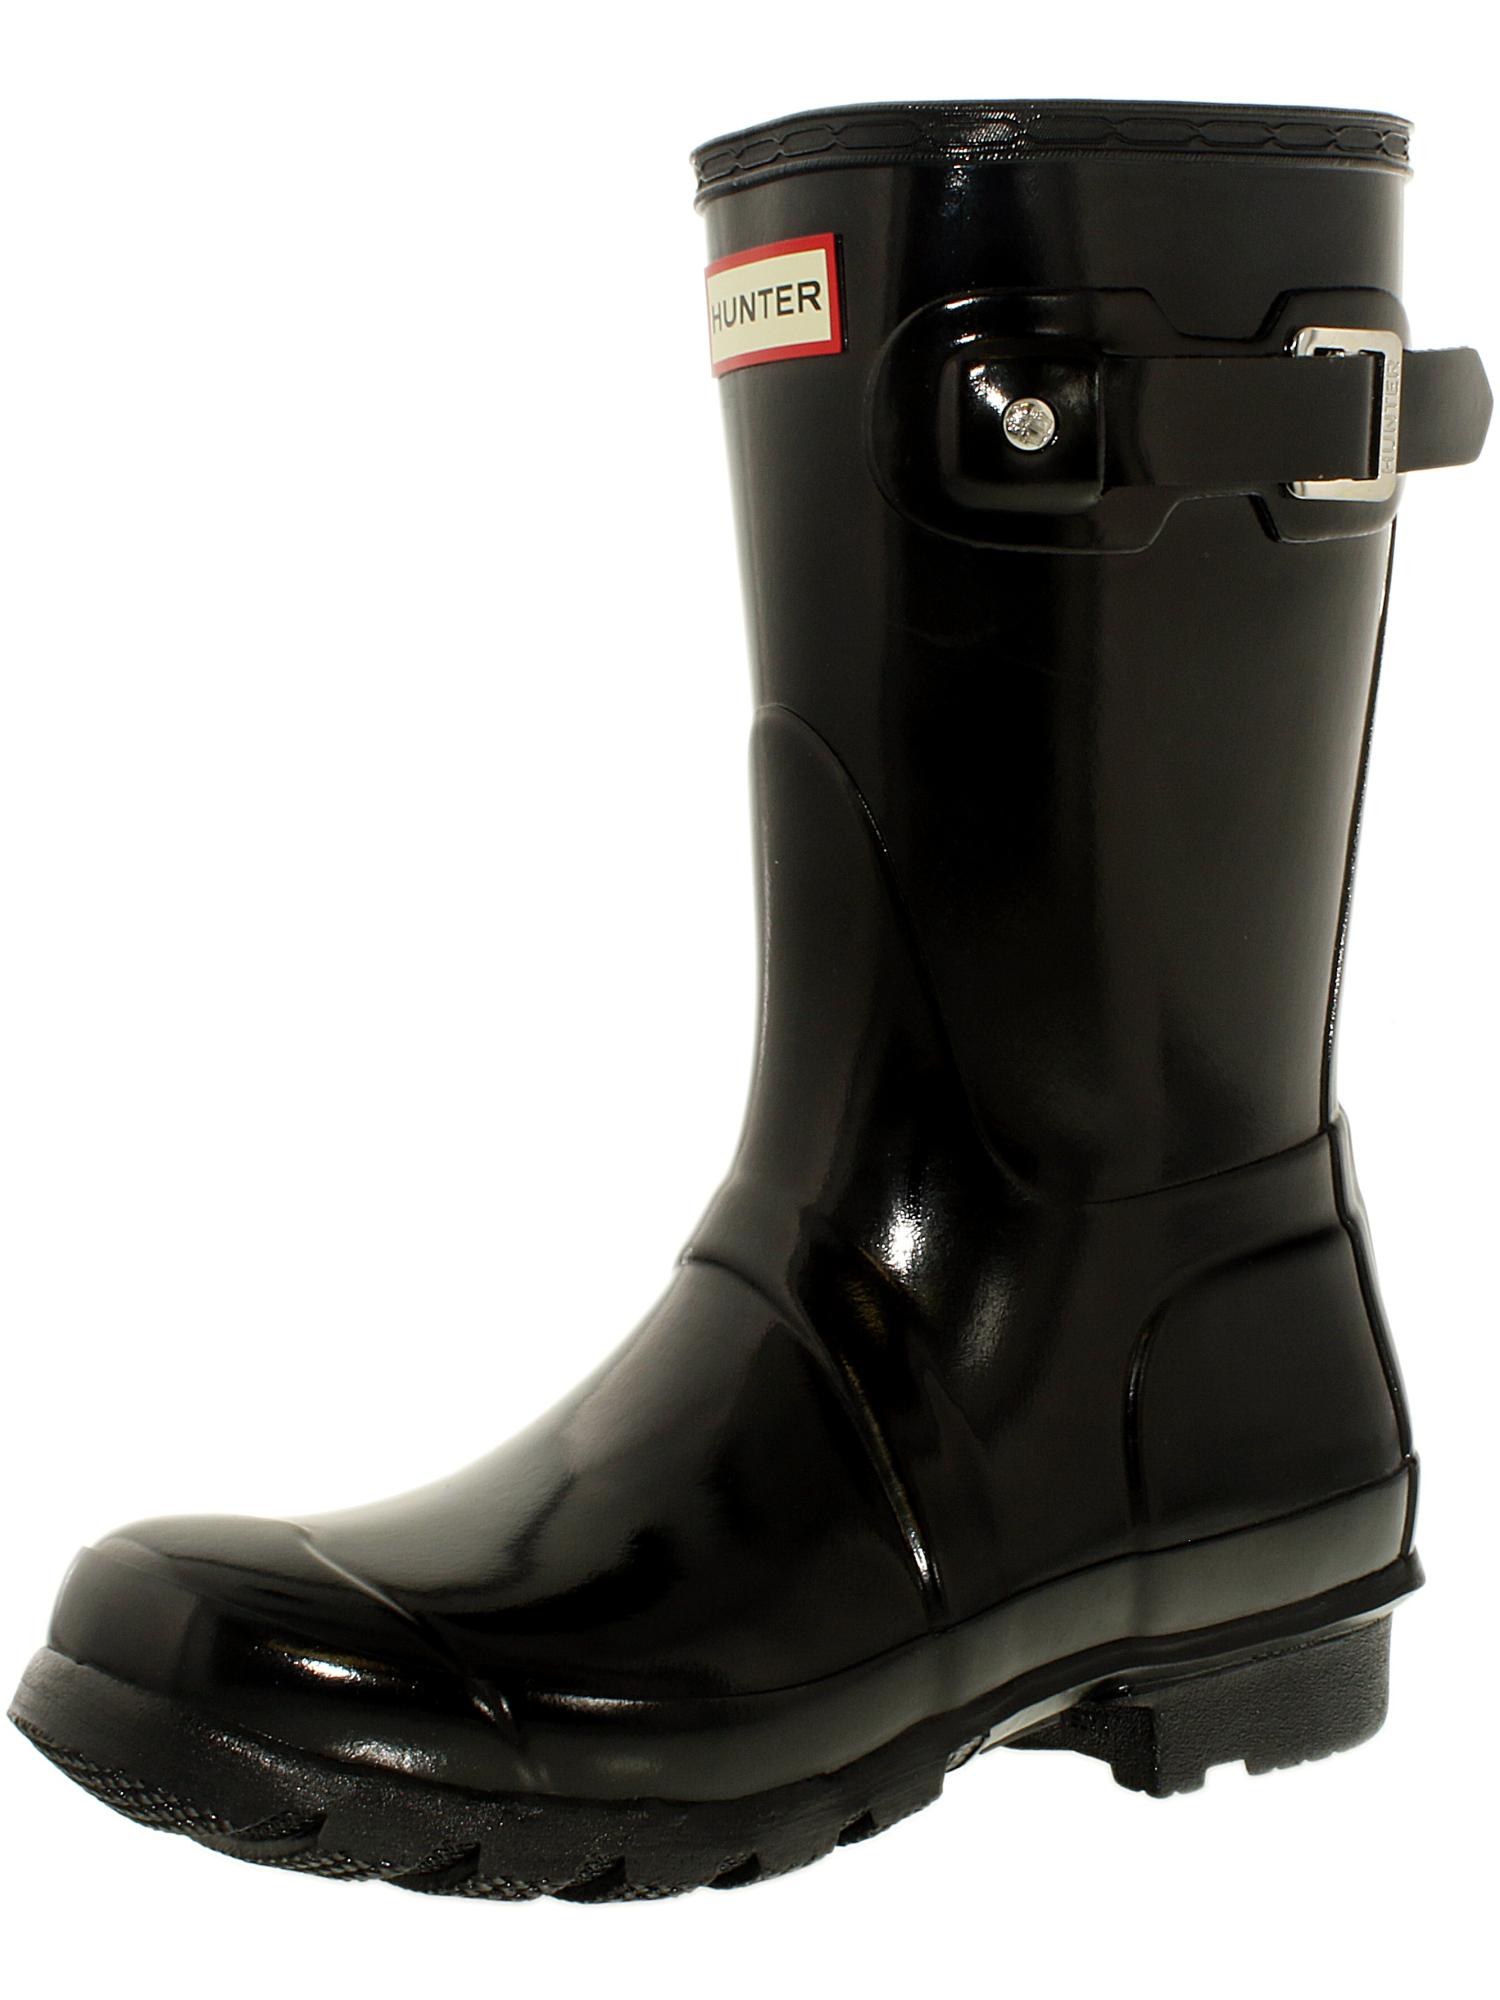 49a331cb3 ... Picture 3 of 3. Hunter Women's Original Short Mid-Calf Rubber Rain Boot